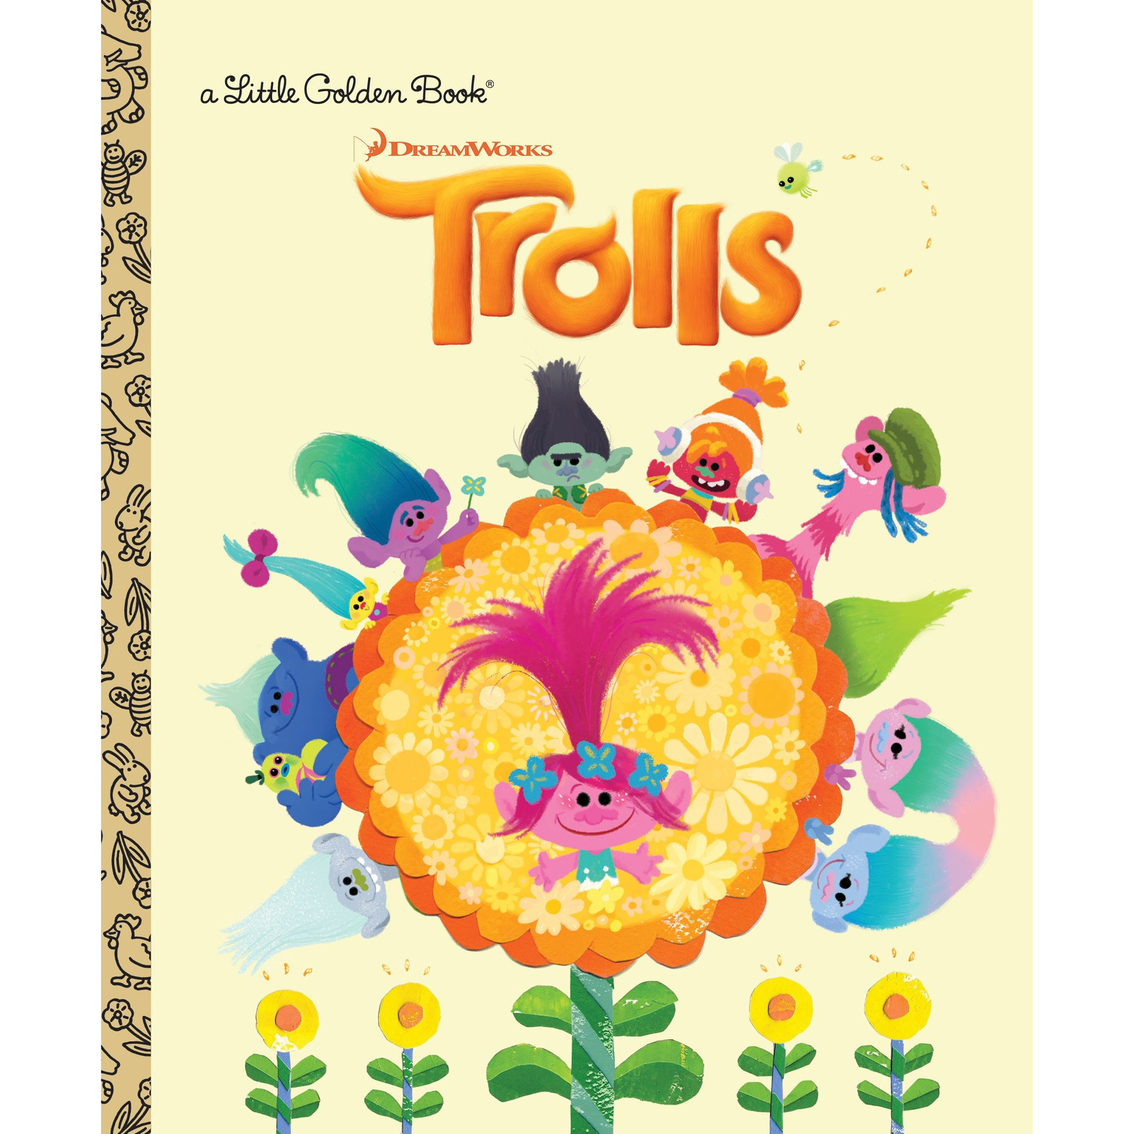 Trolls Little Golden Book (dreamworks Trolls) | Children\'s Books ...